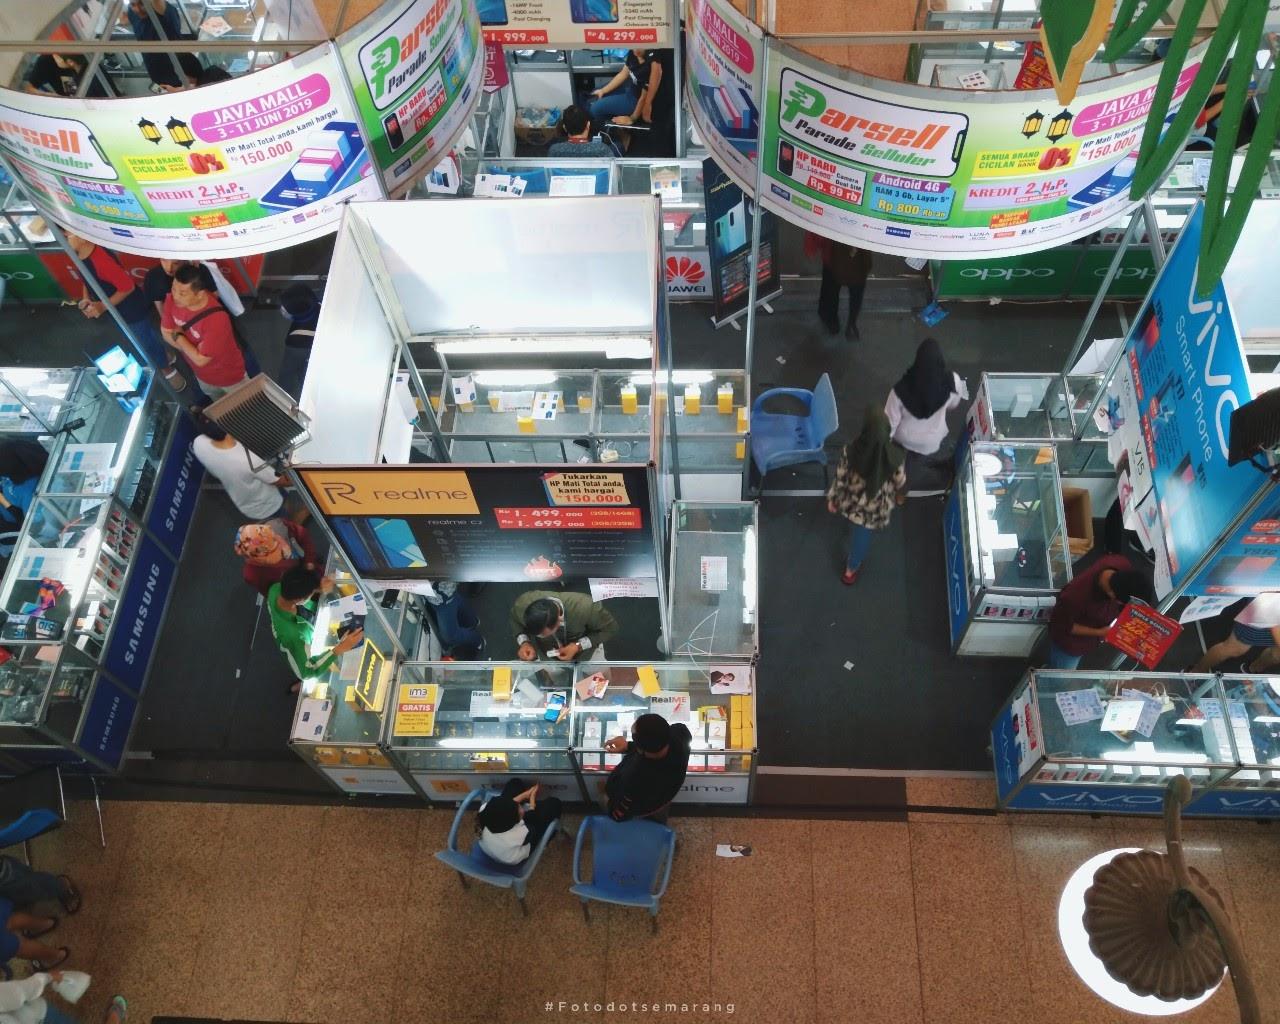 Pameran Handphone 'Parsell' 2019, Ditengah Banyak Pameran Selama Lebaran